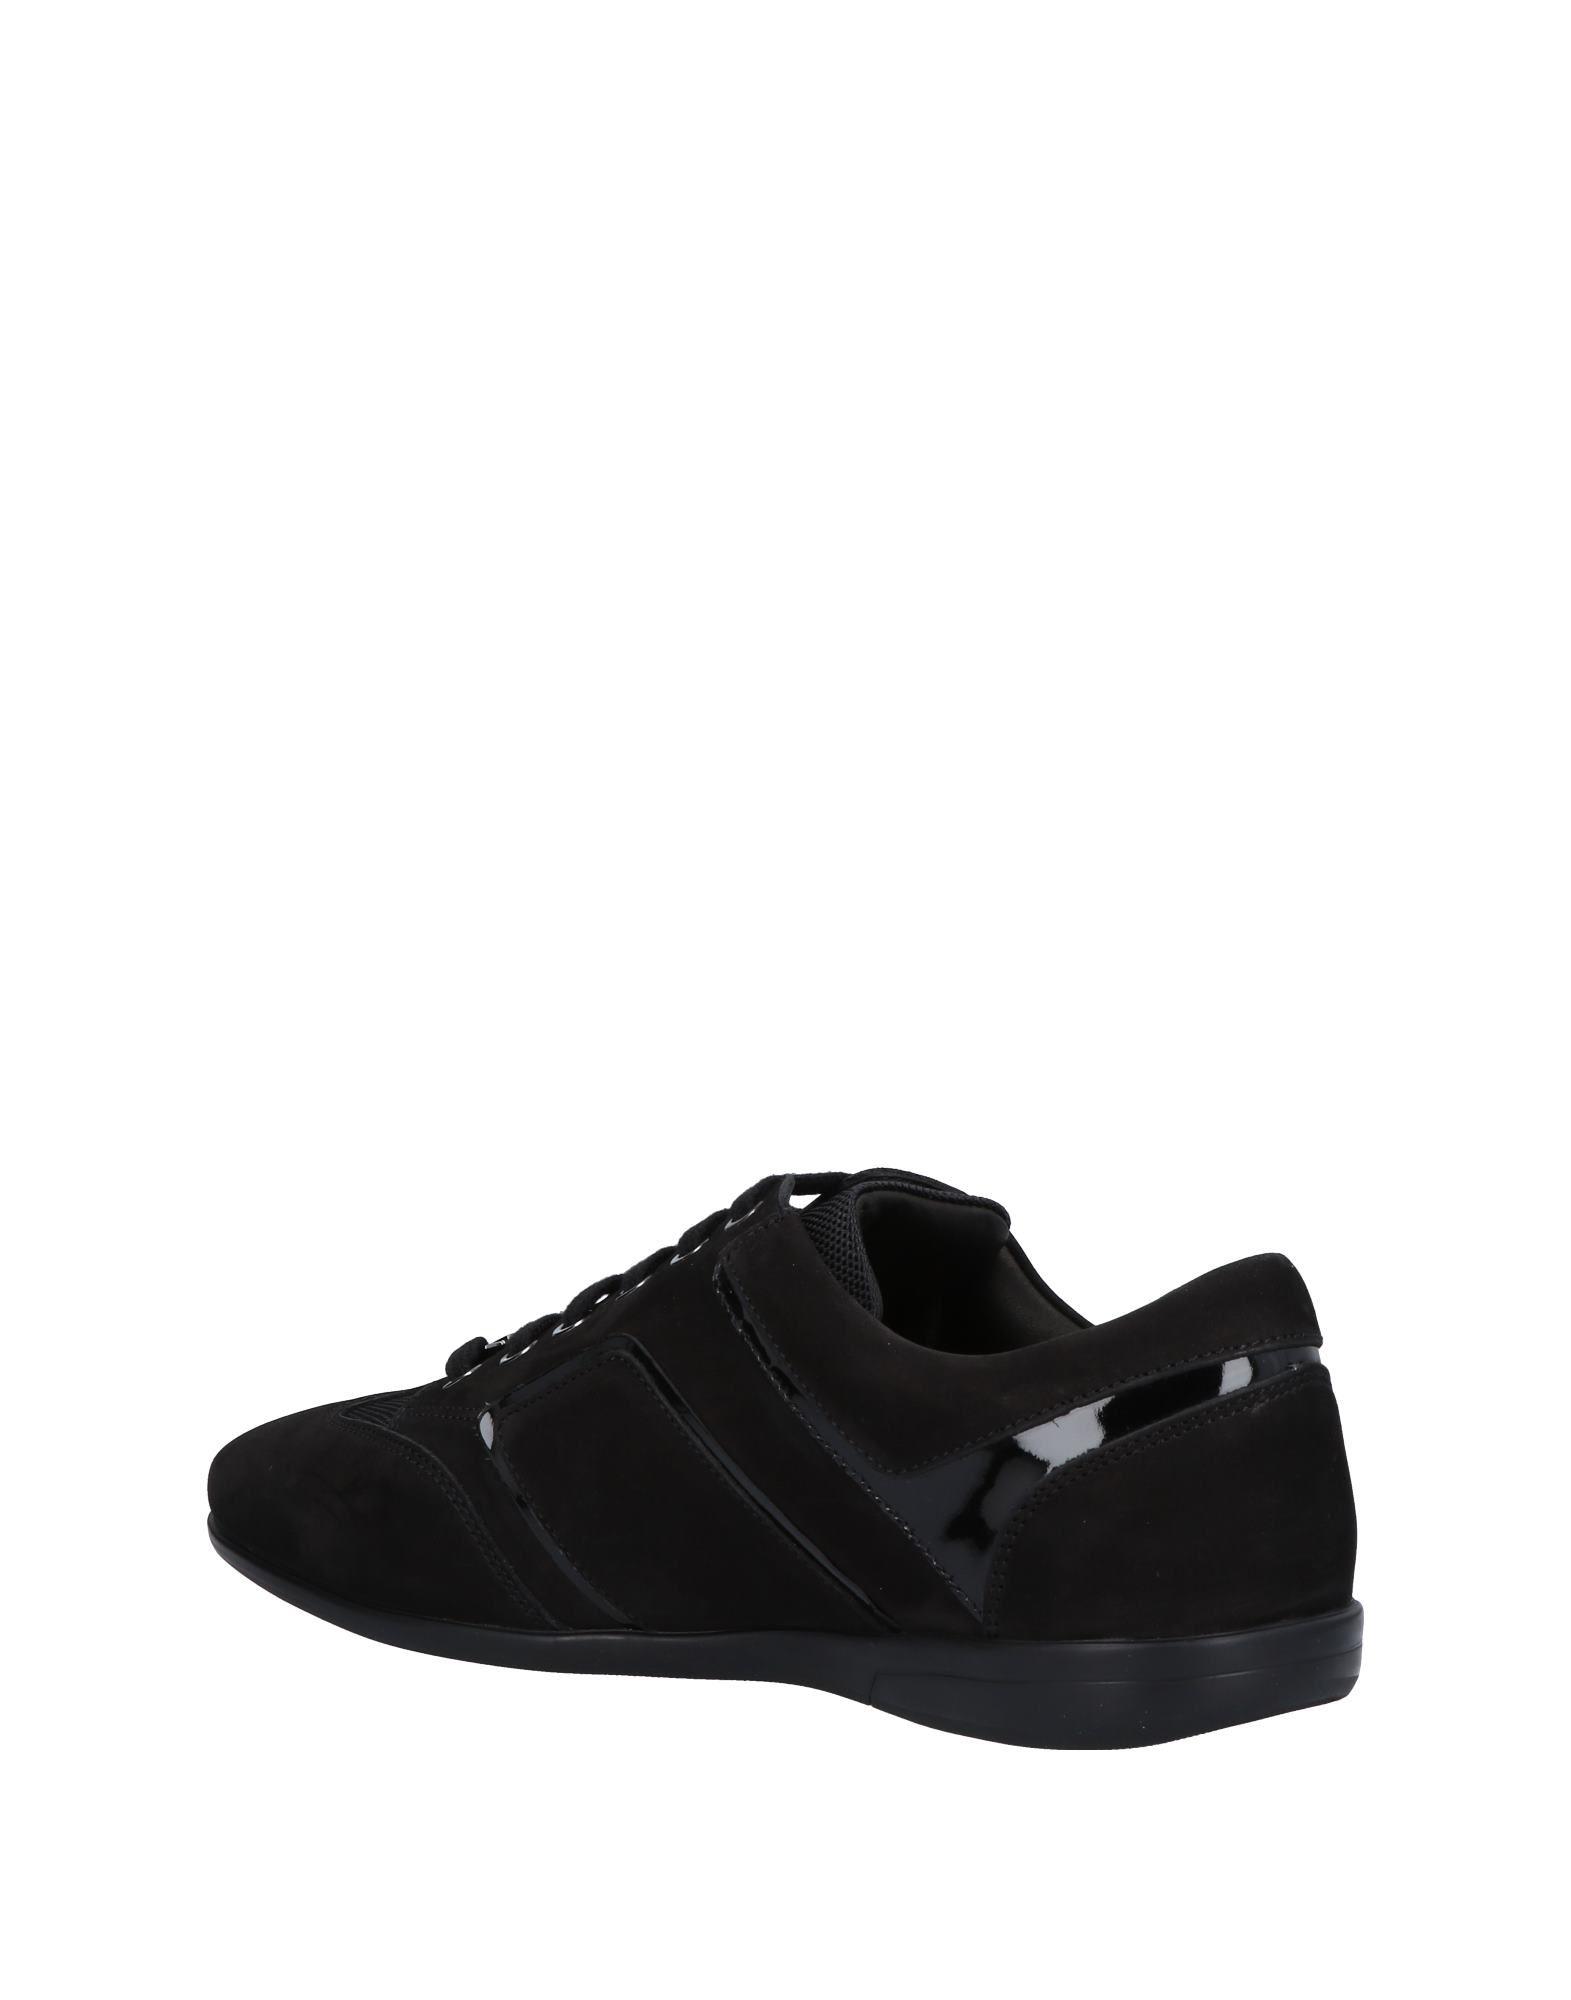 Versace Collection Sneakers Herren  Schuhe 11463338SO Neue Schuhe  3da80b